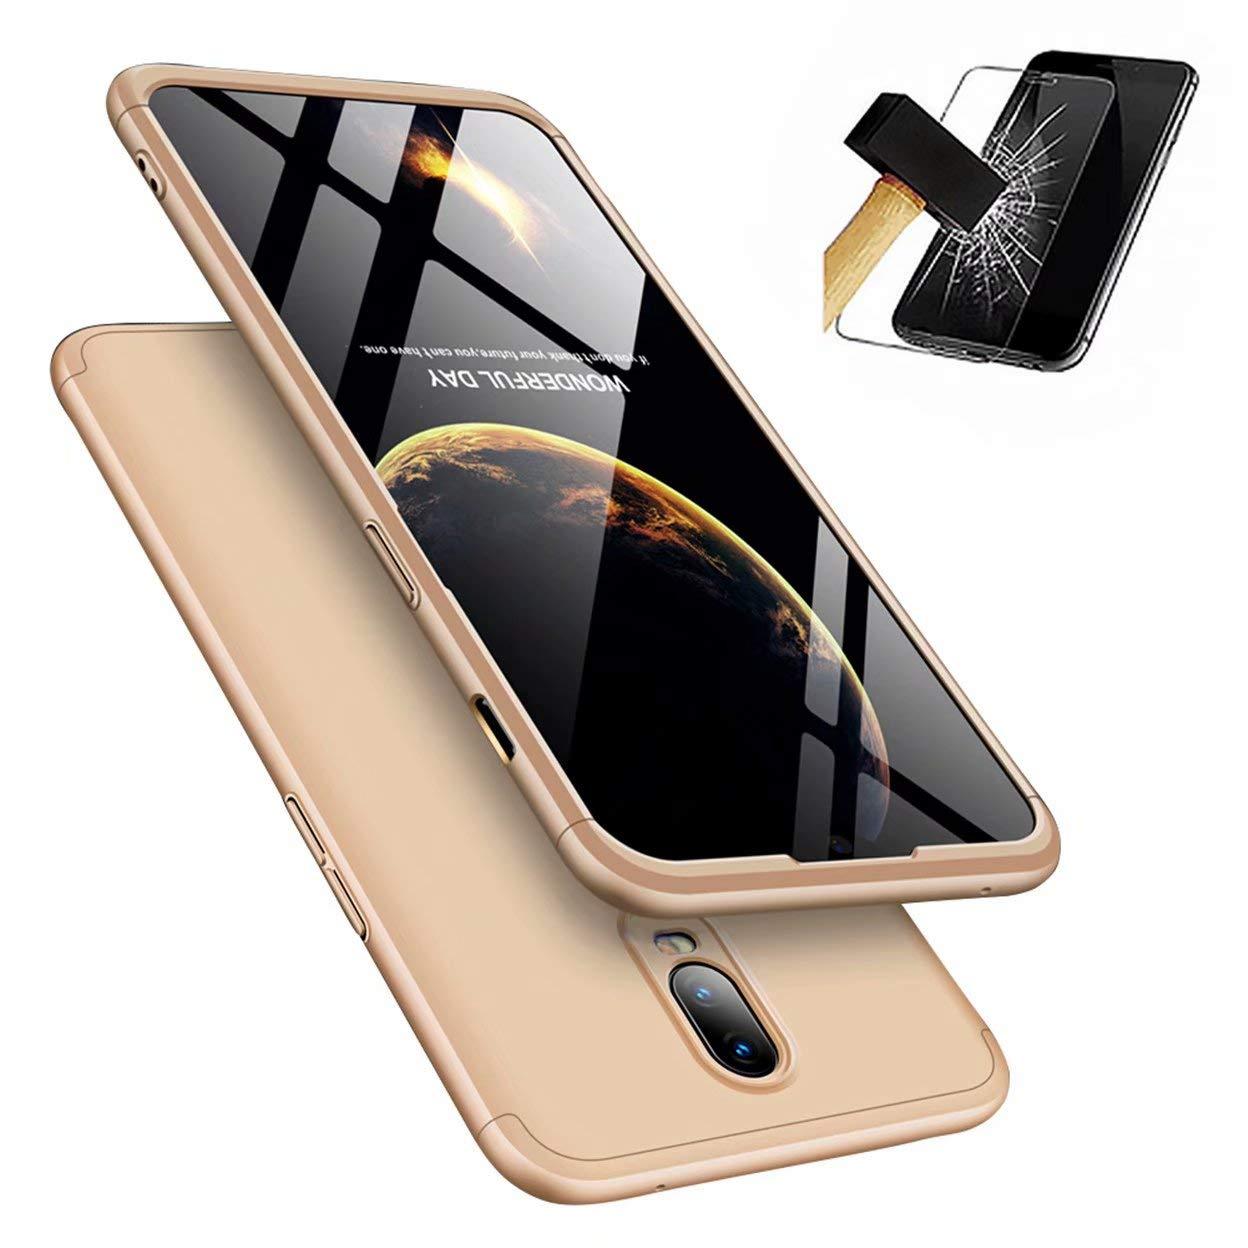 OnePlus 6ケース、[スクリーンプロテクター]付きOne-Protectiveシェル付きLaixin 360°フルカバーPC 3、OnePlus 6用超薄型バンパー(ゴールド)   B07L5PM178